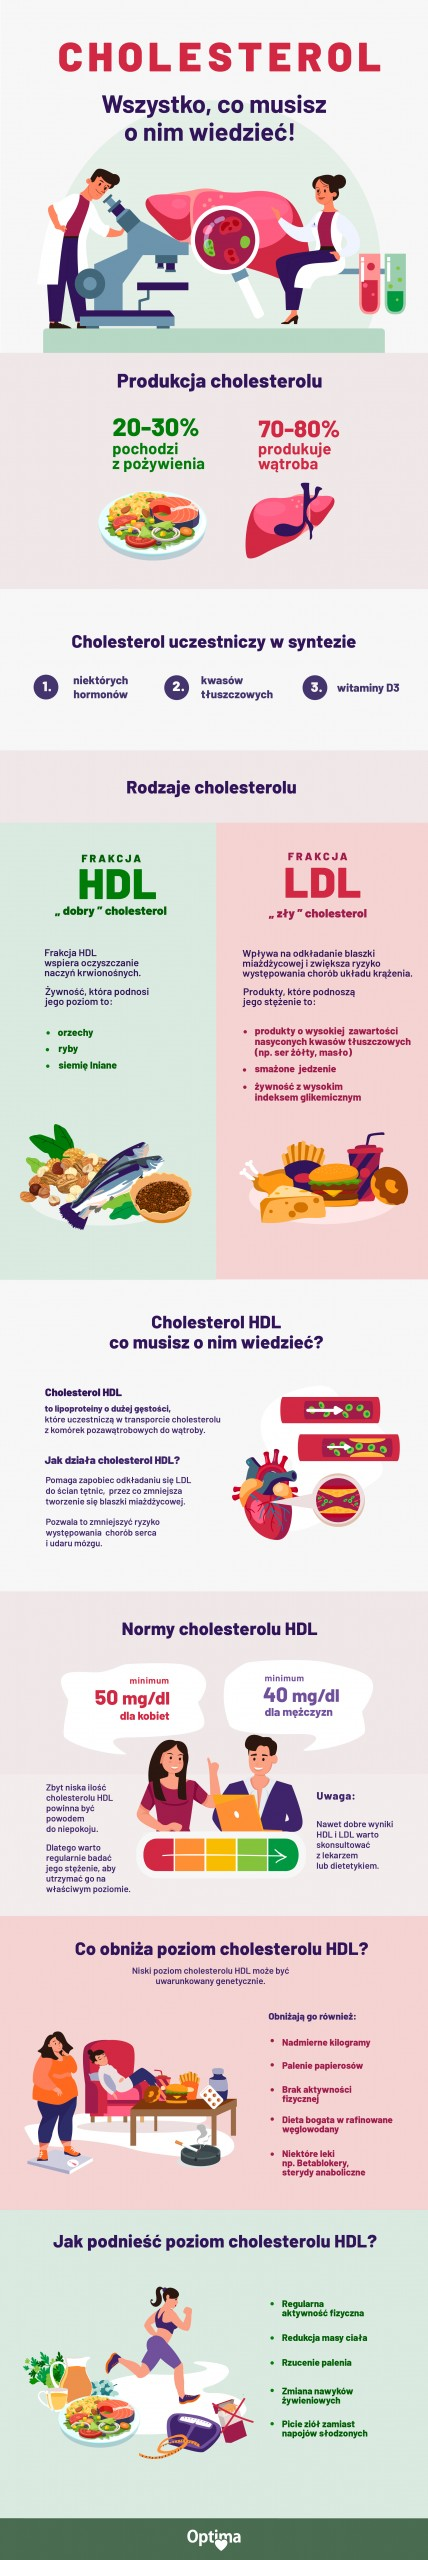 Inografika Cholesterol